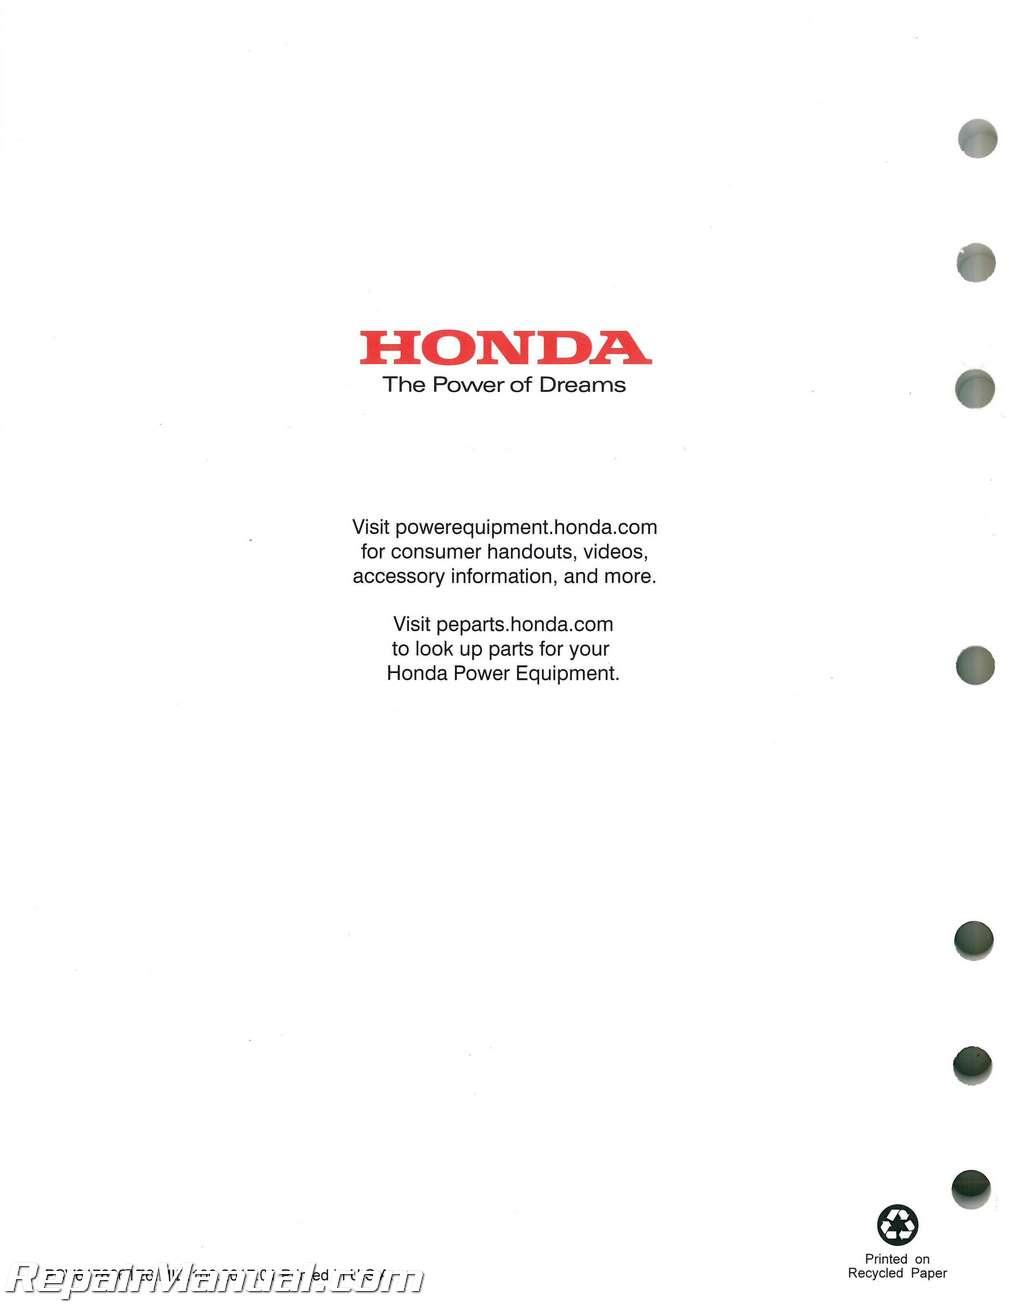 honda hs624 hs724 hs828 hs928 hs1132 snowblower shop manual rh repairmanual com honda hs928 service manual pdf honda hs928 shop manual download